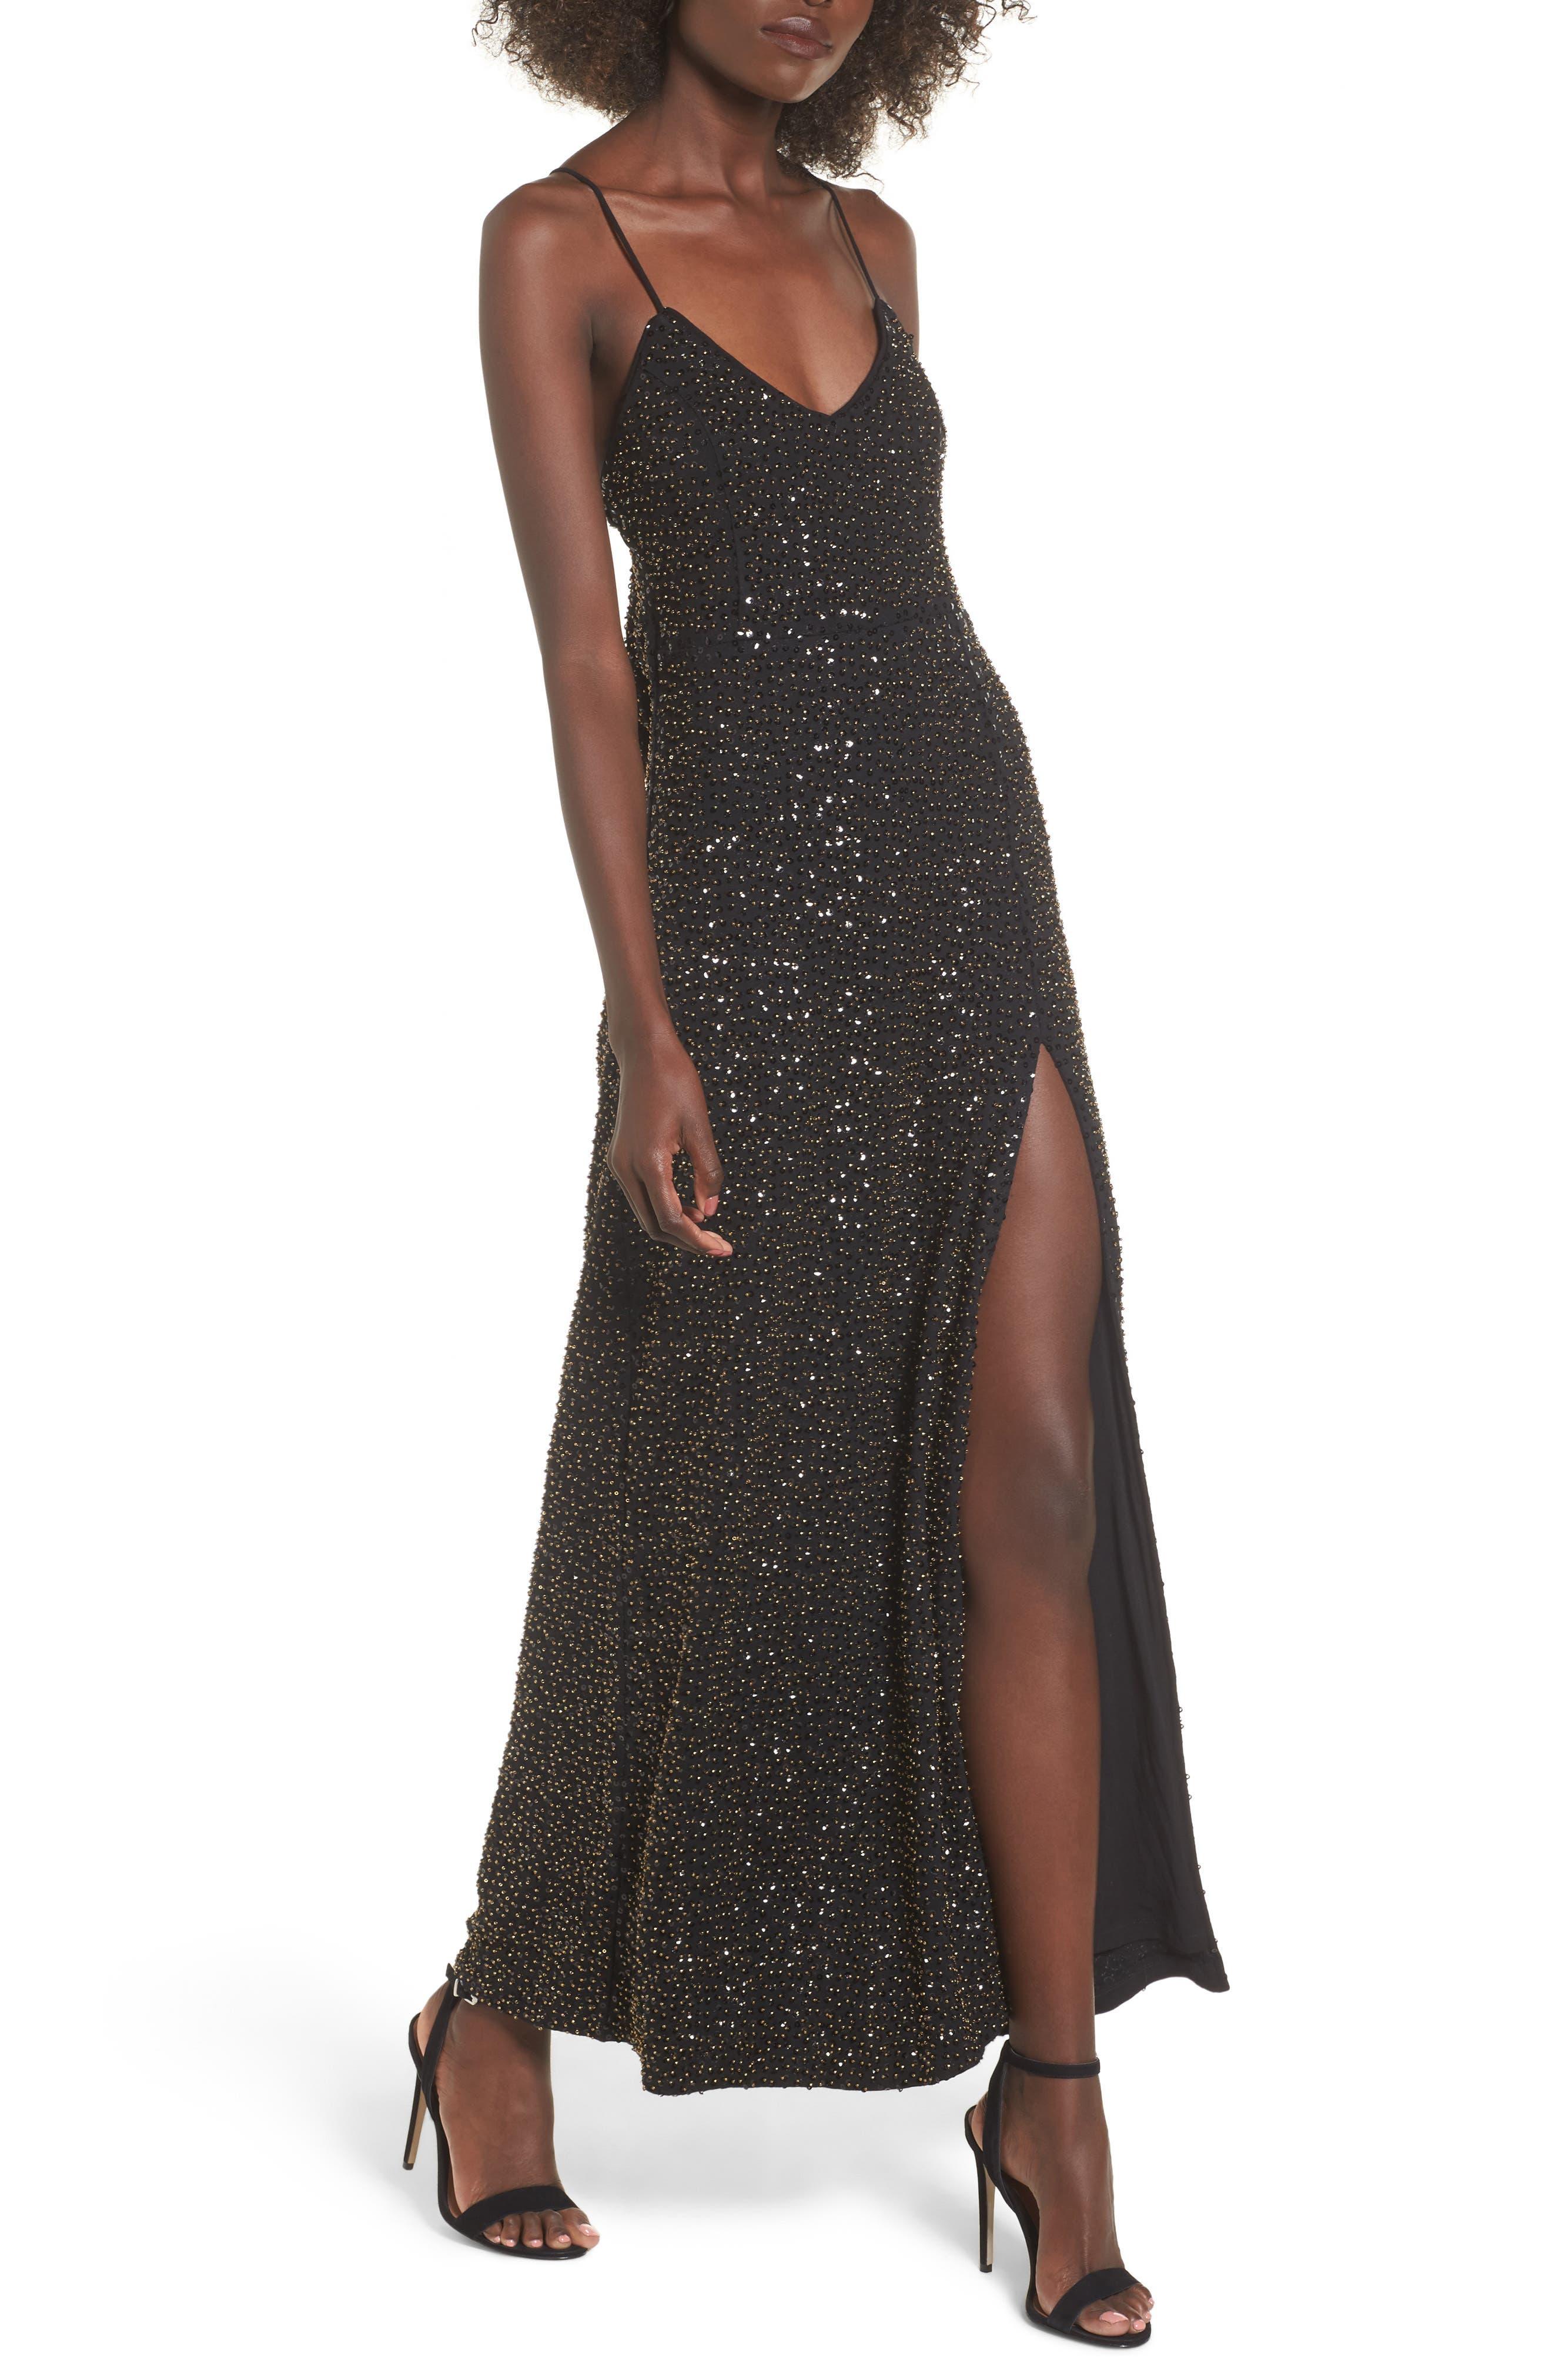 Gracen Maxi Dress,                             Main thumbnail 1, color,                             Black/ Brass